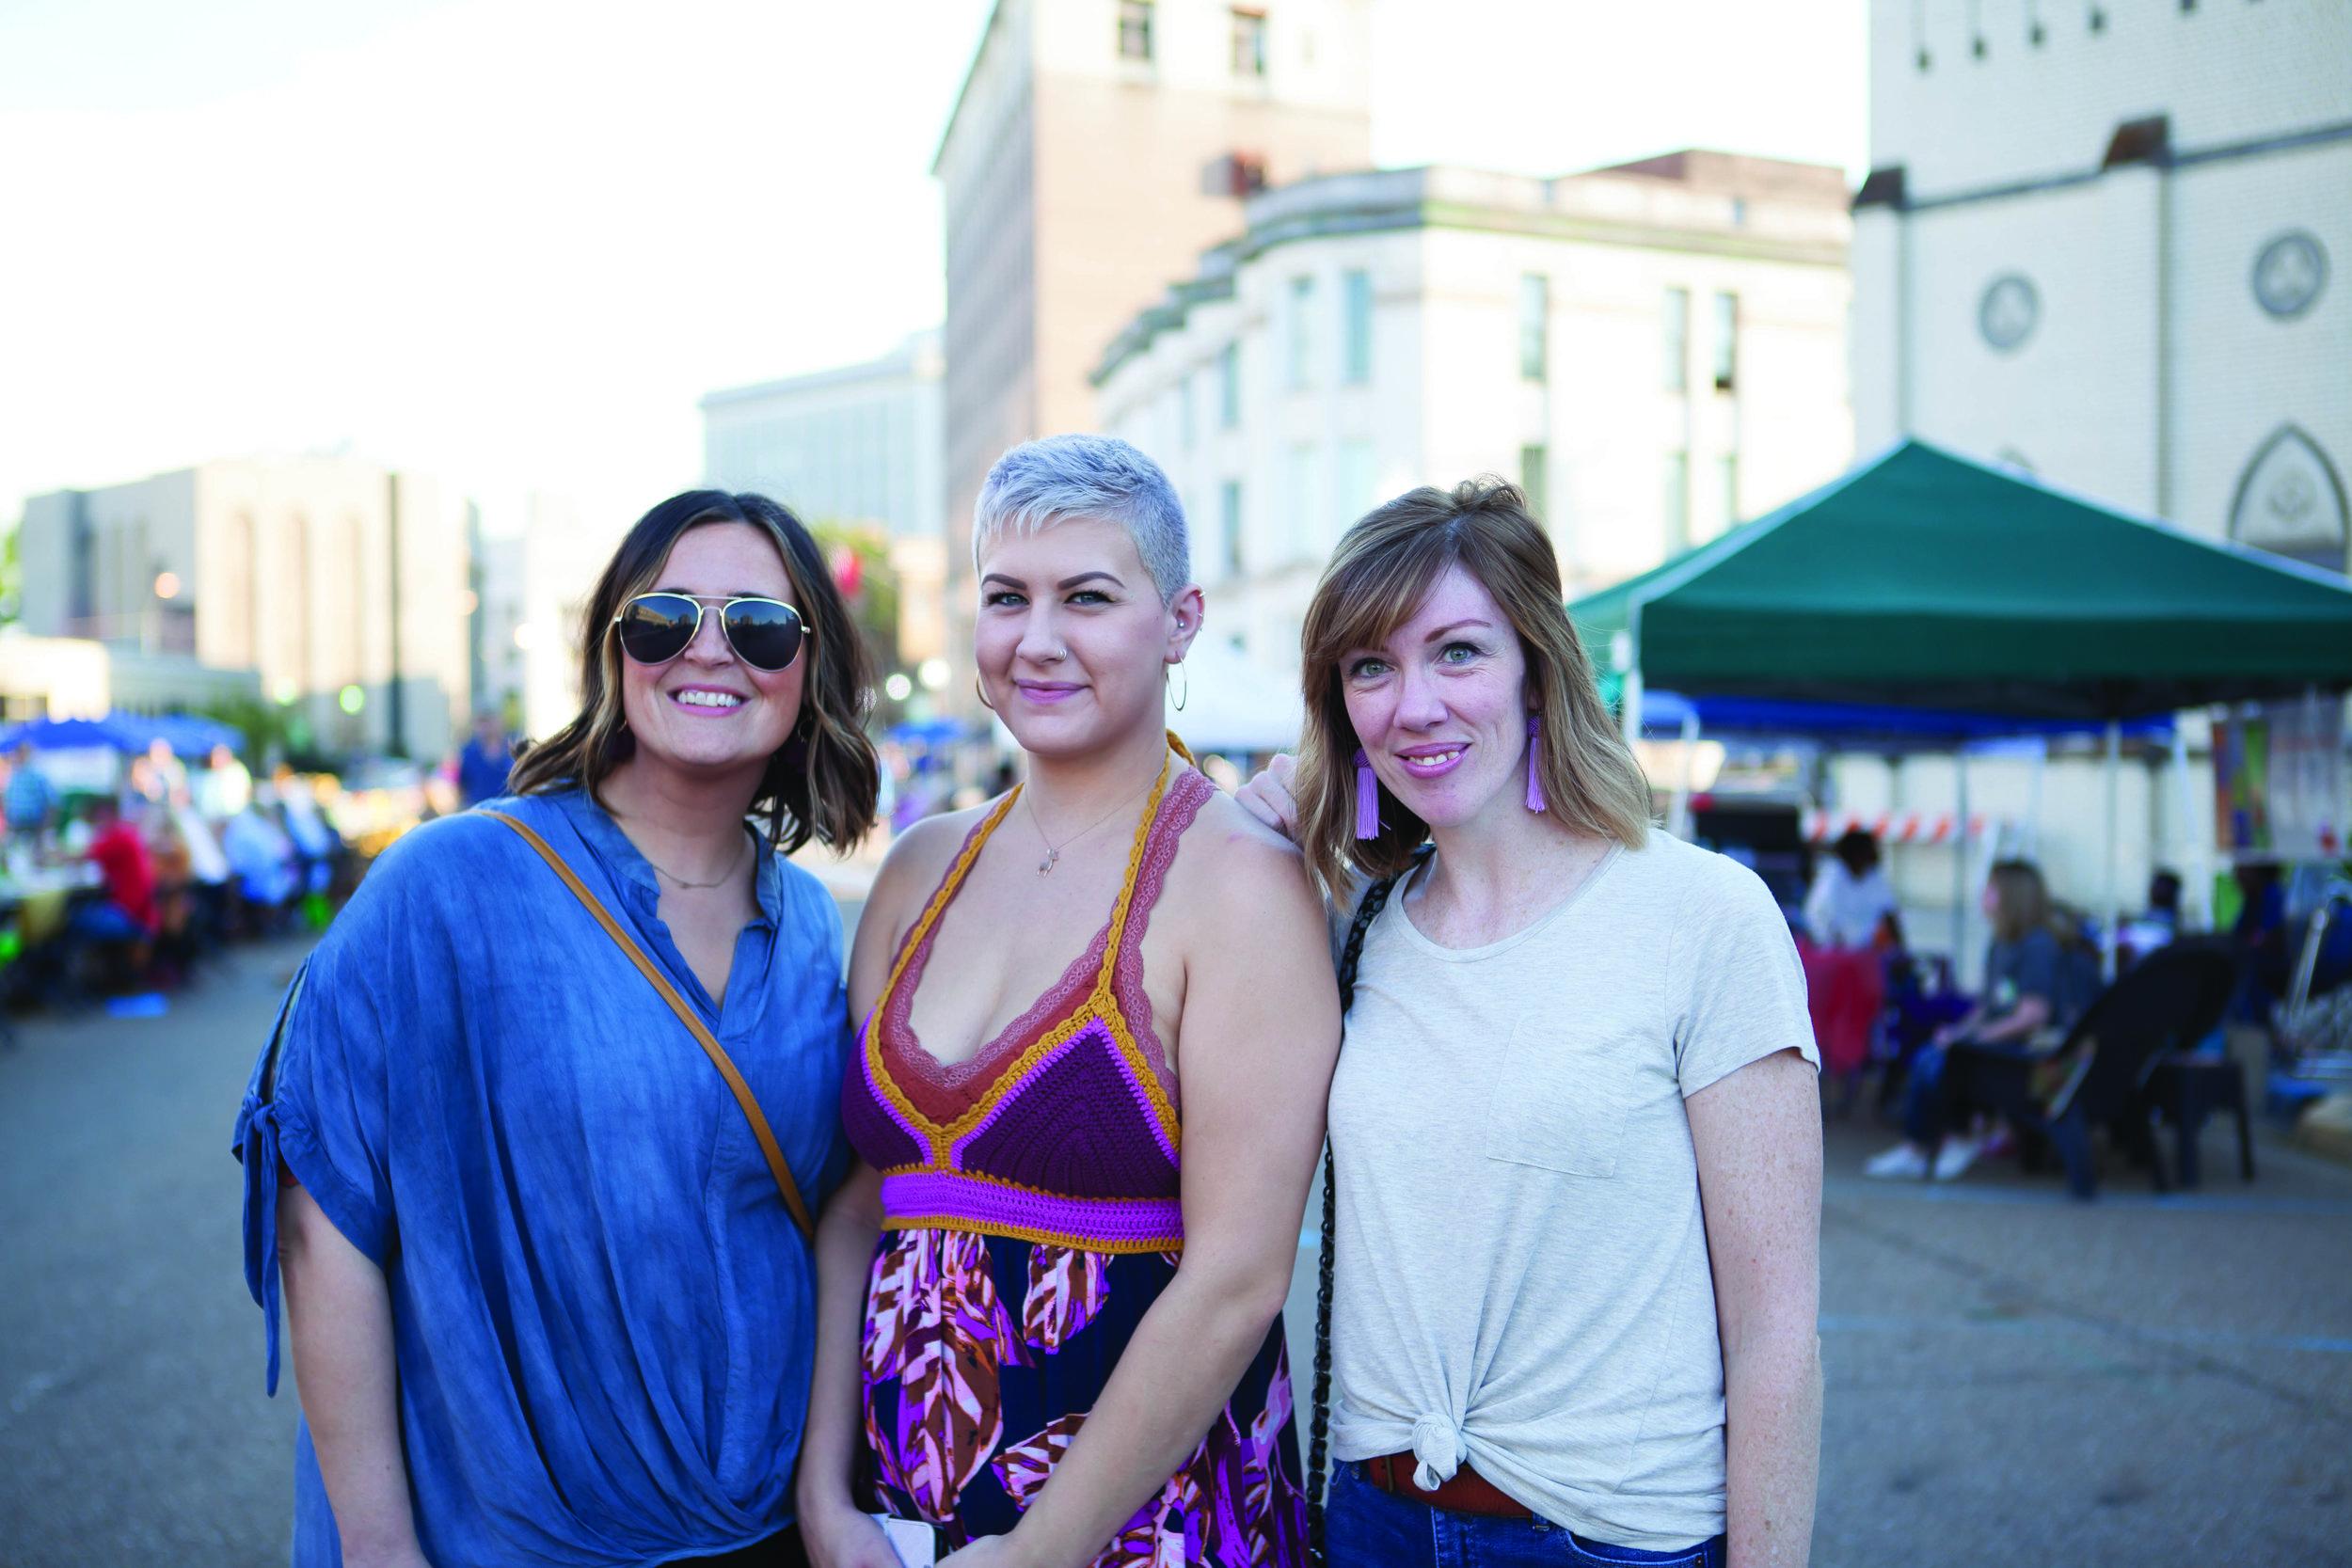 Sam Whitlow, Mandy McGonigal and Dani Hamblett